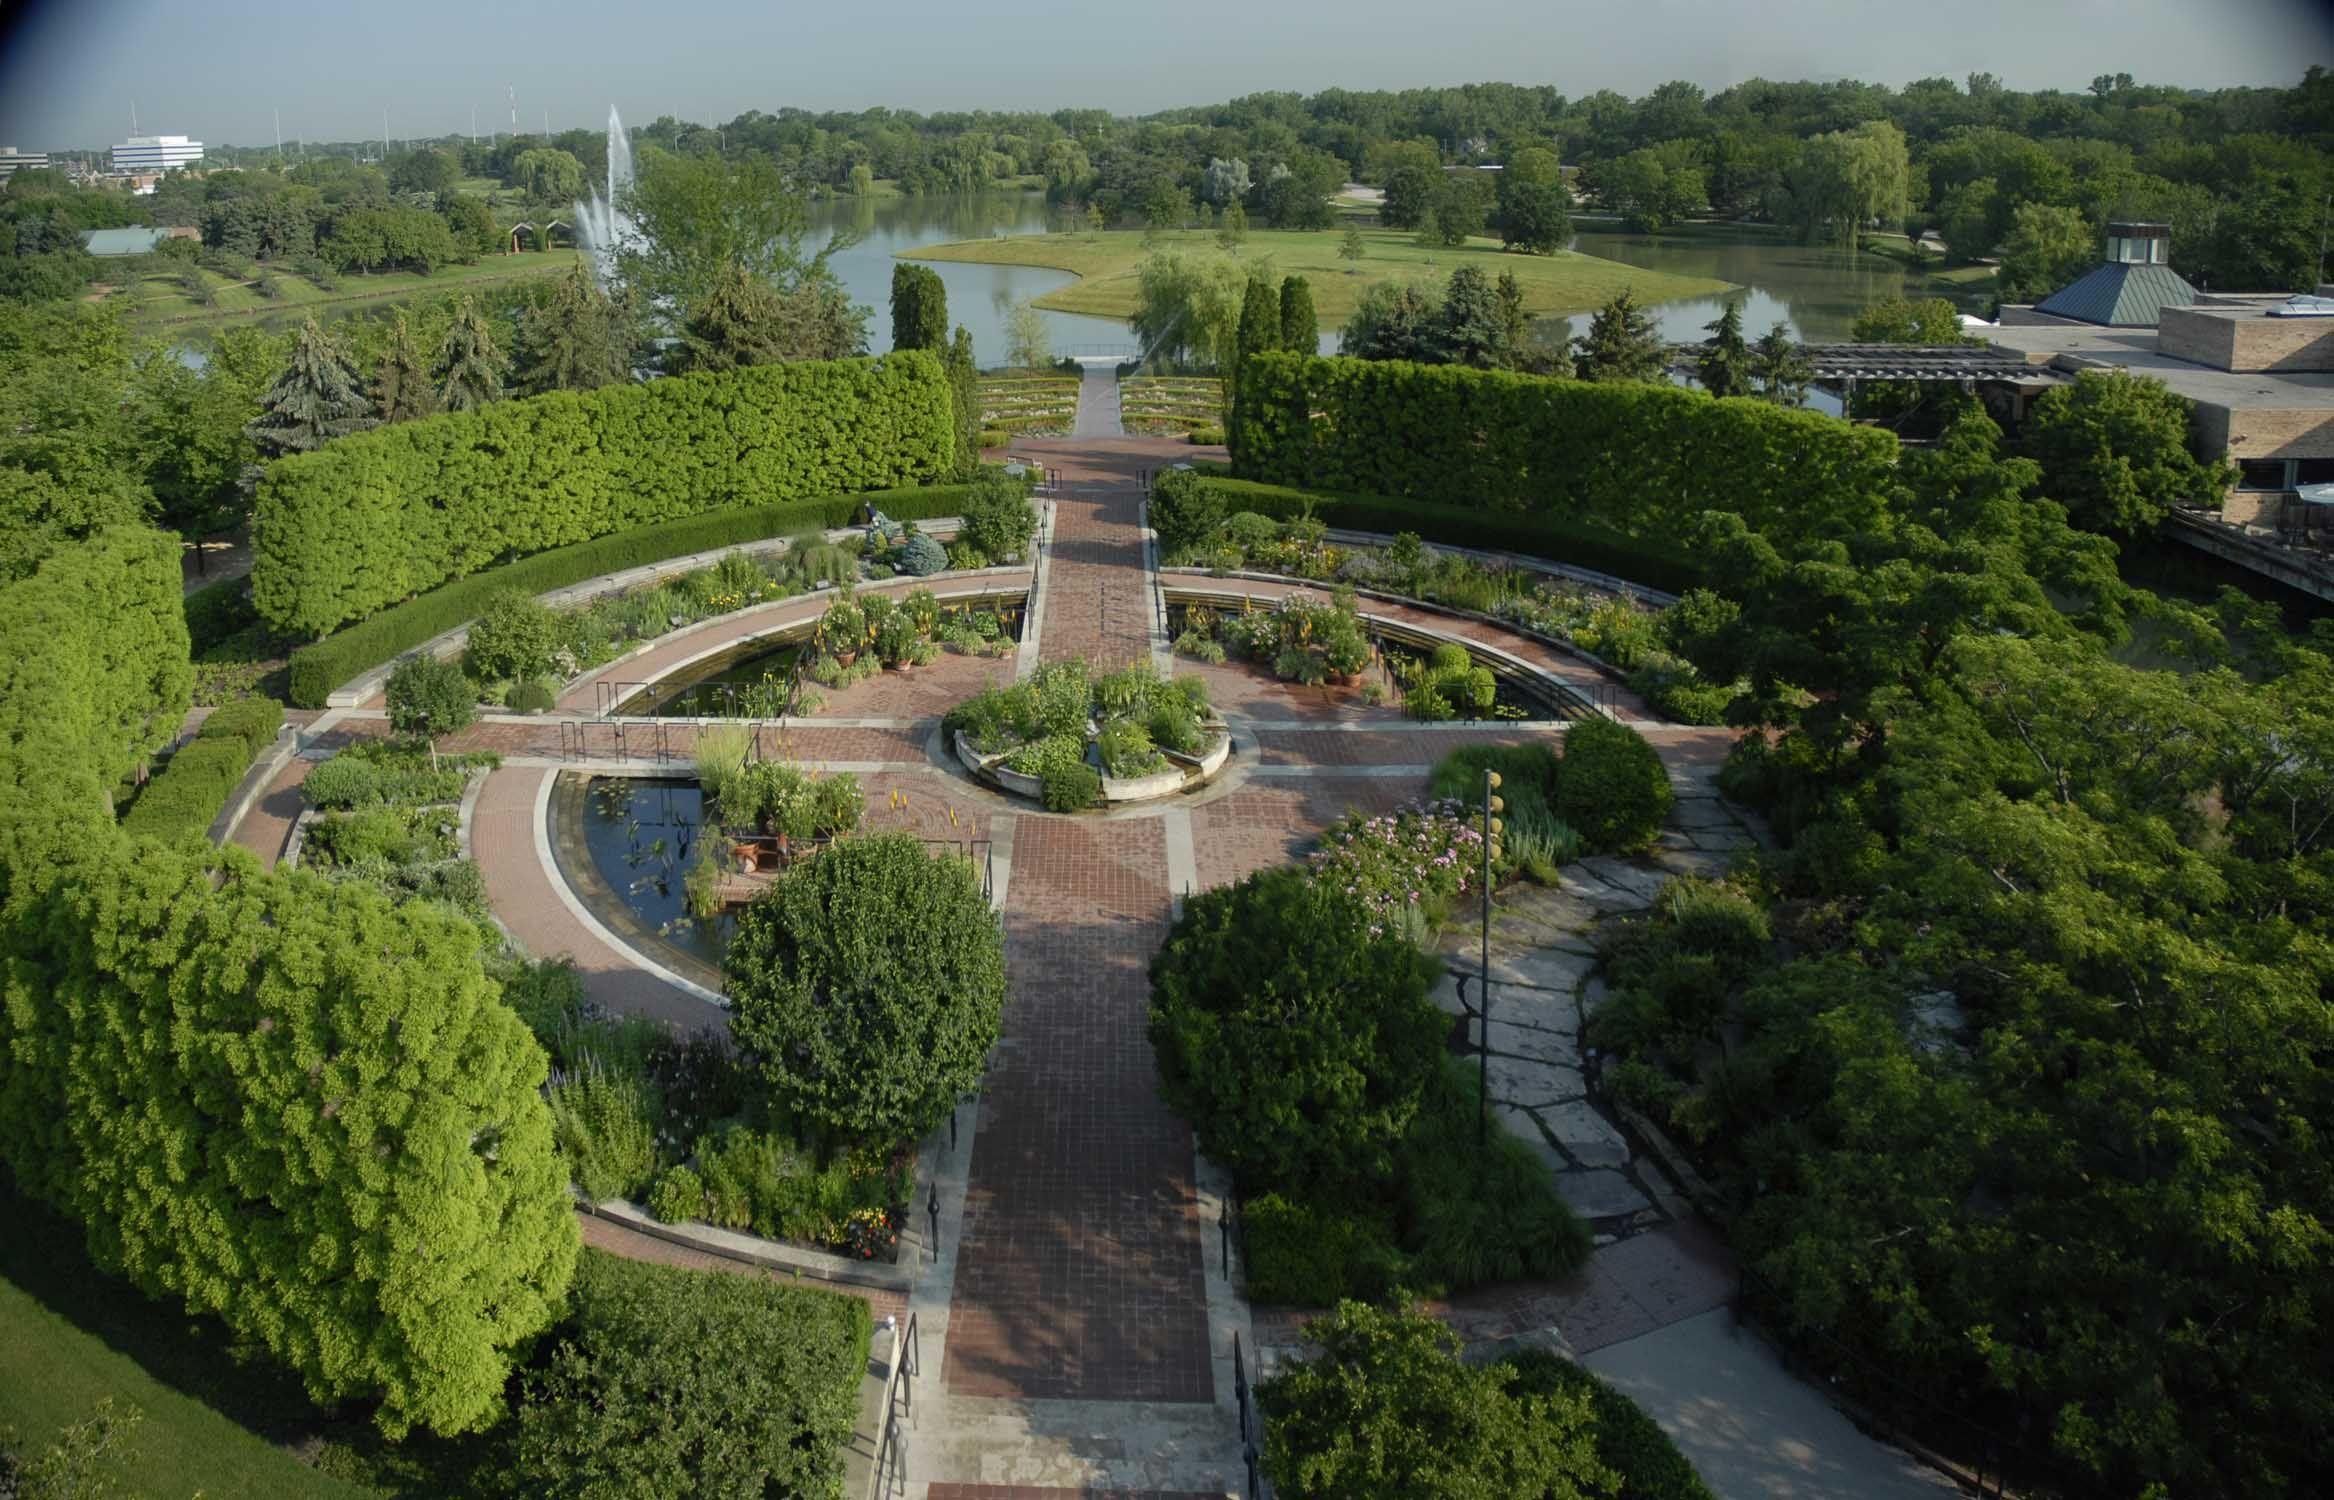 Pictures Of Botanical Gardens In Chicago | CHICAGO BOTANIC GARDEN  CELEBRATES 40TH